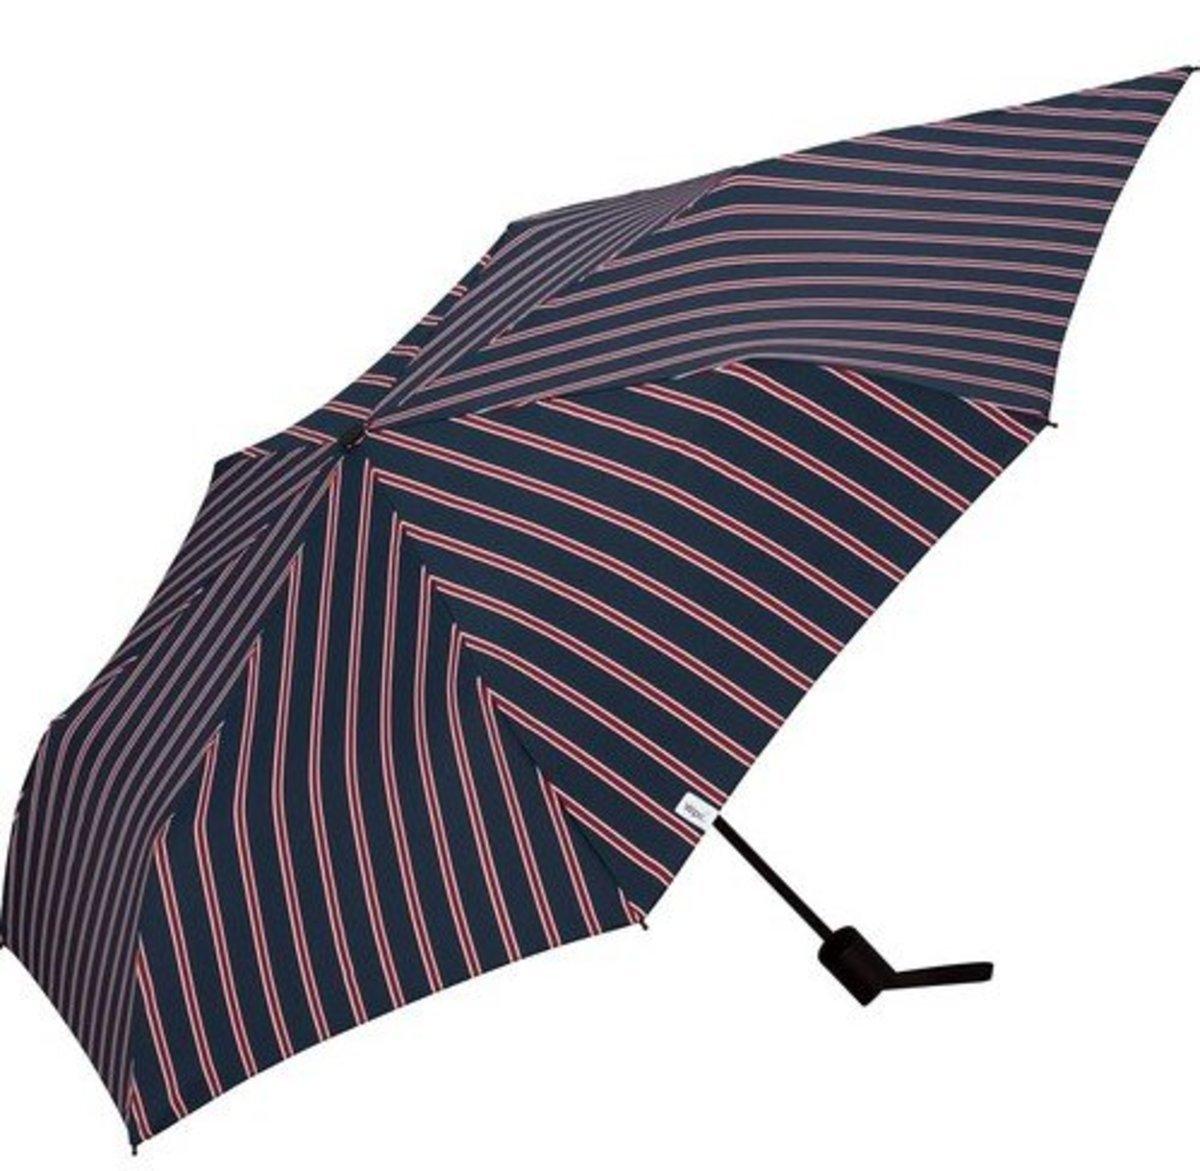 Back Protect Folding Umbrella - School Stripe (MSS-011)